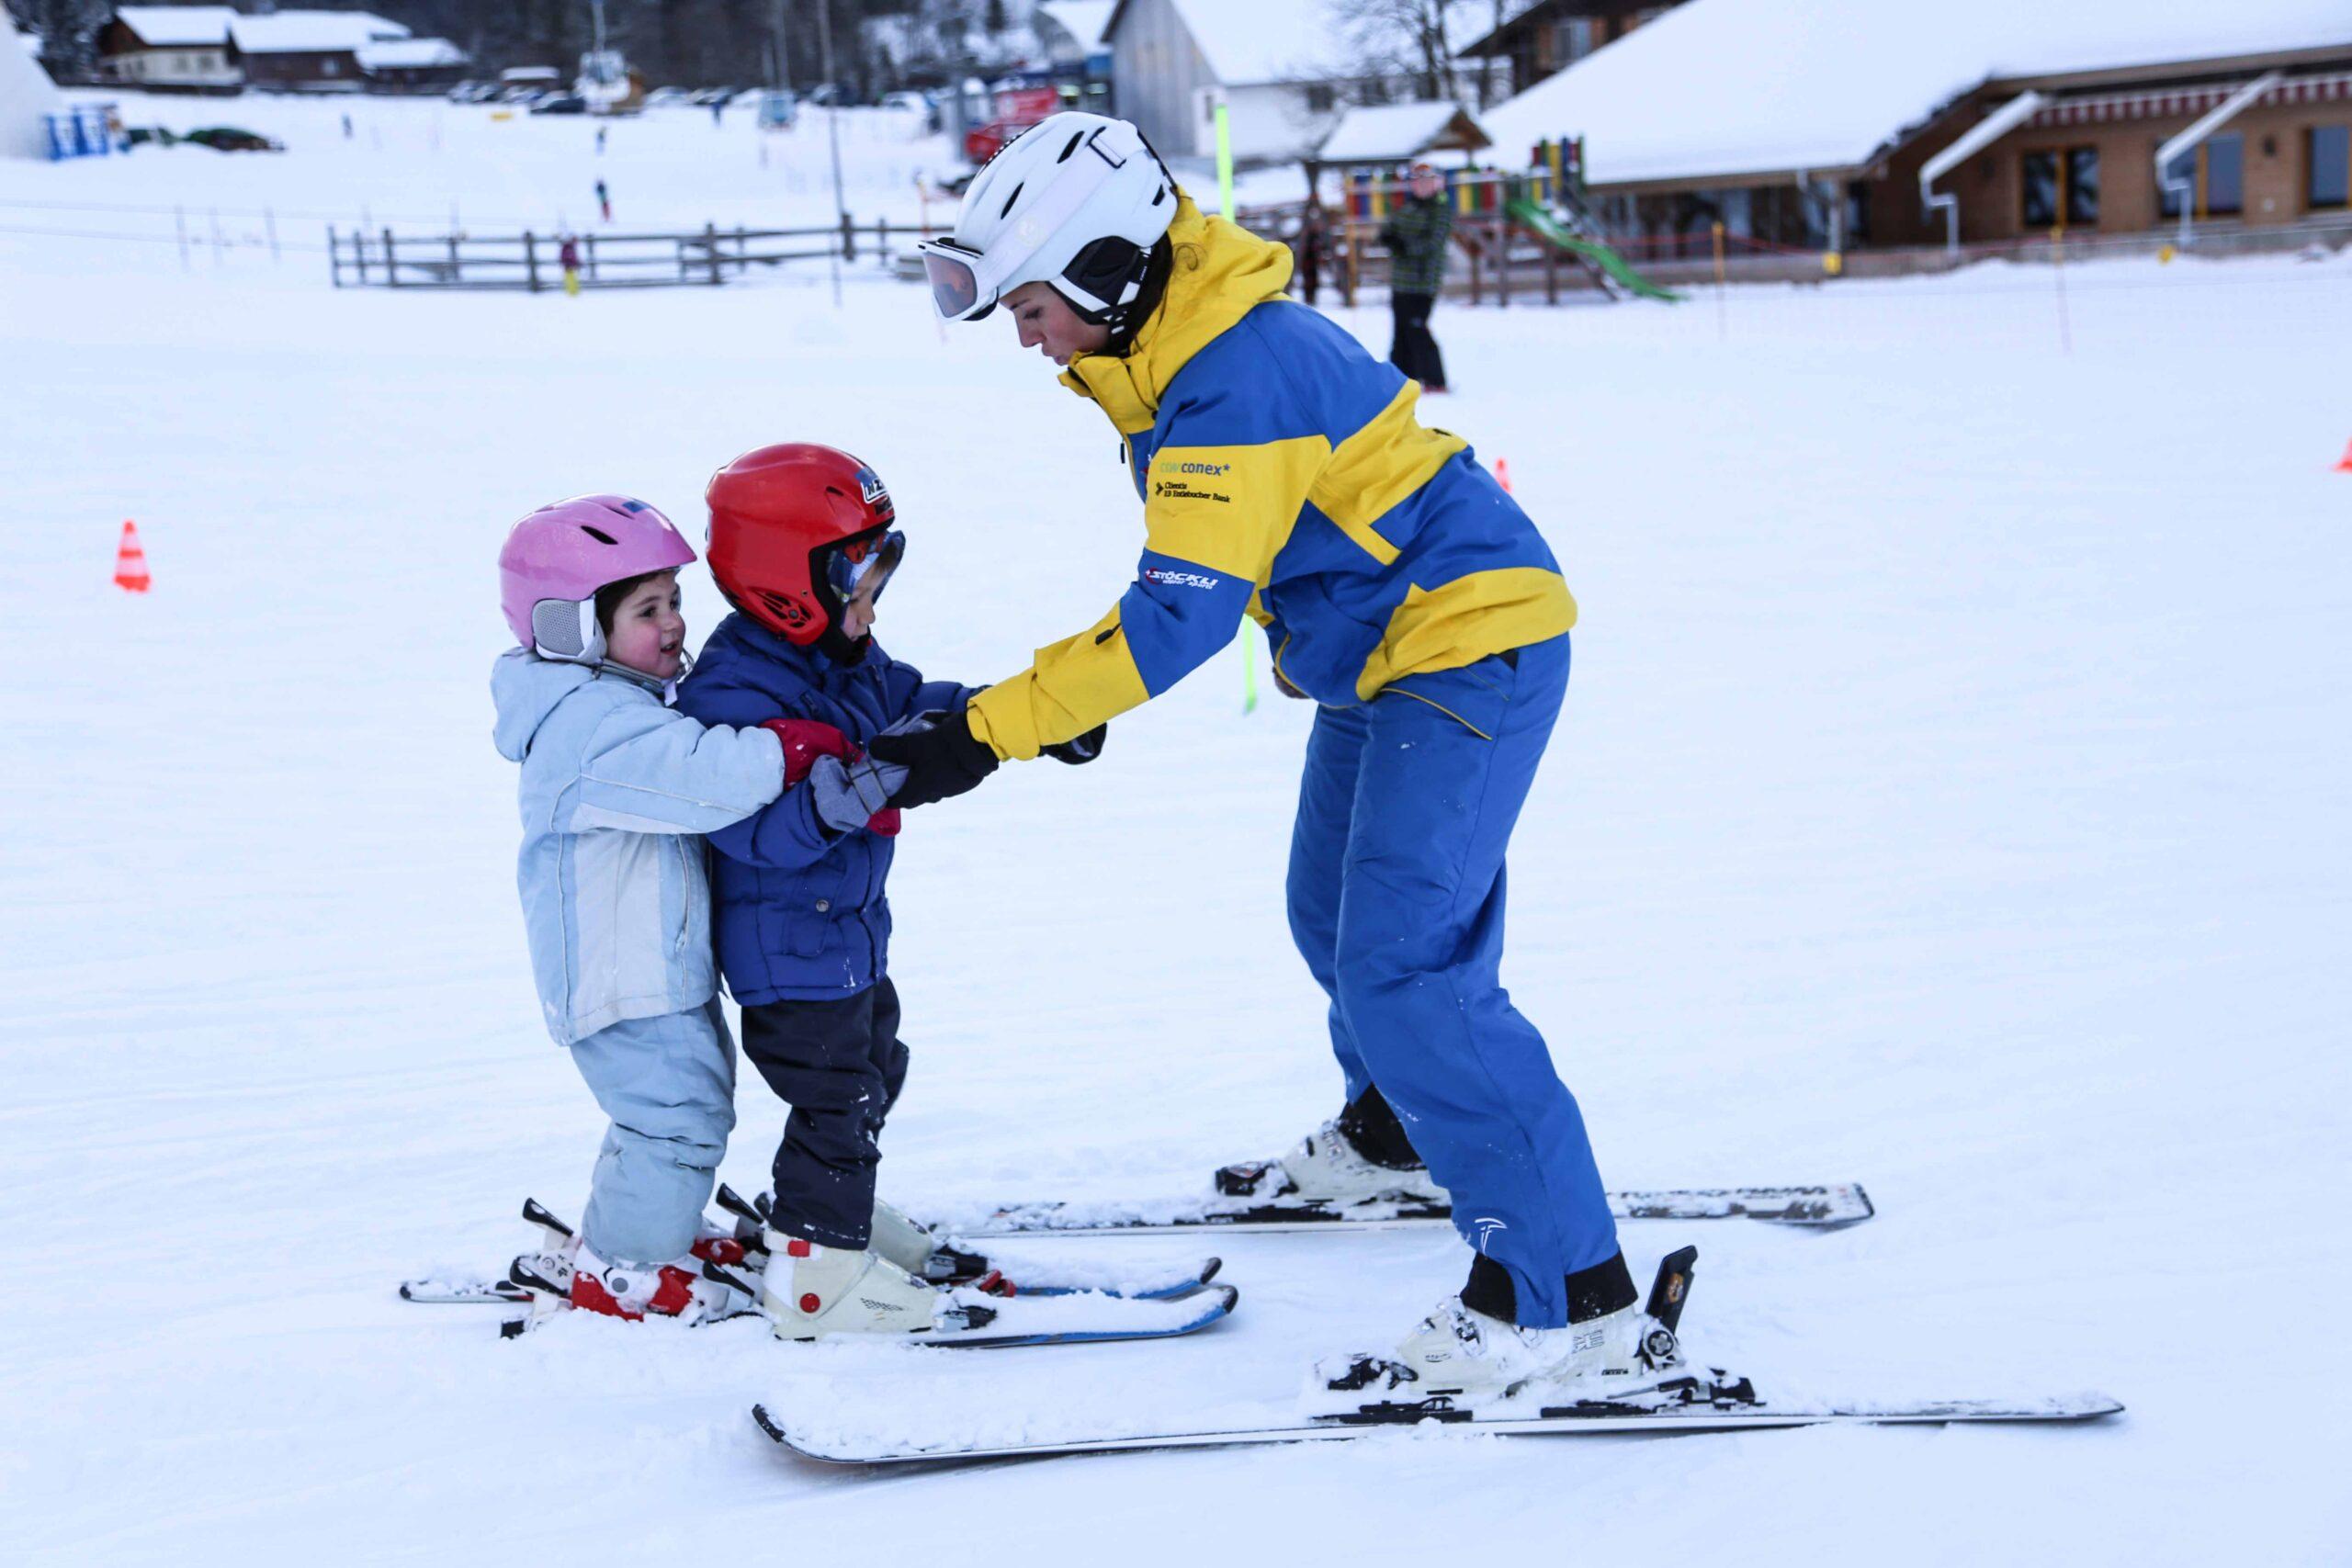 Skischule Marbach - Kids